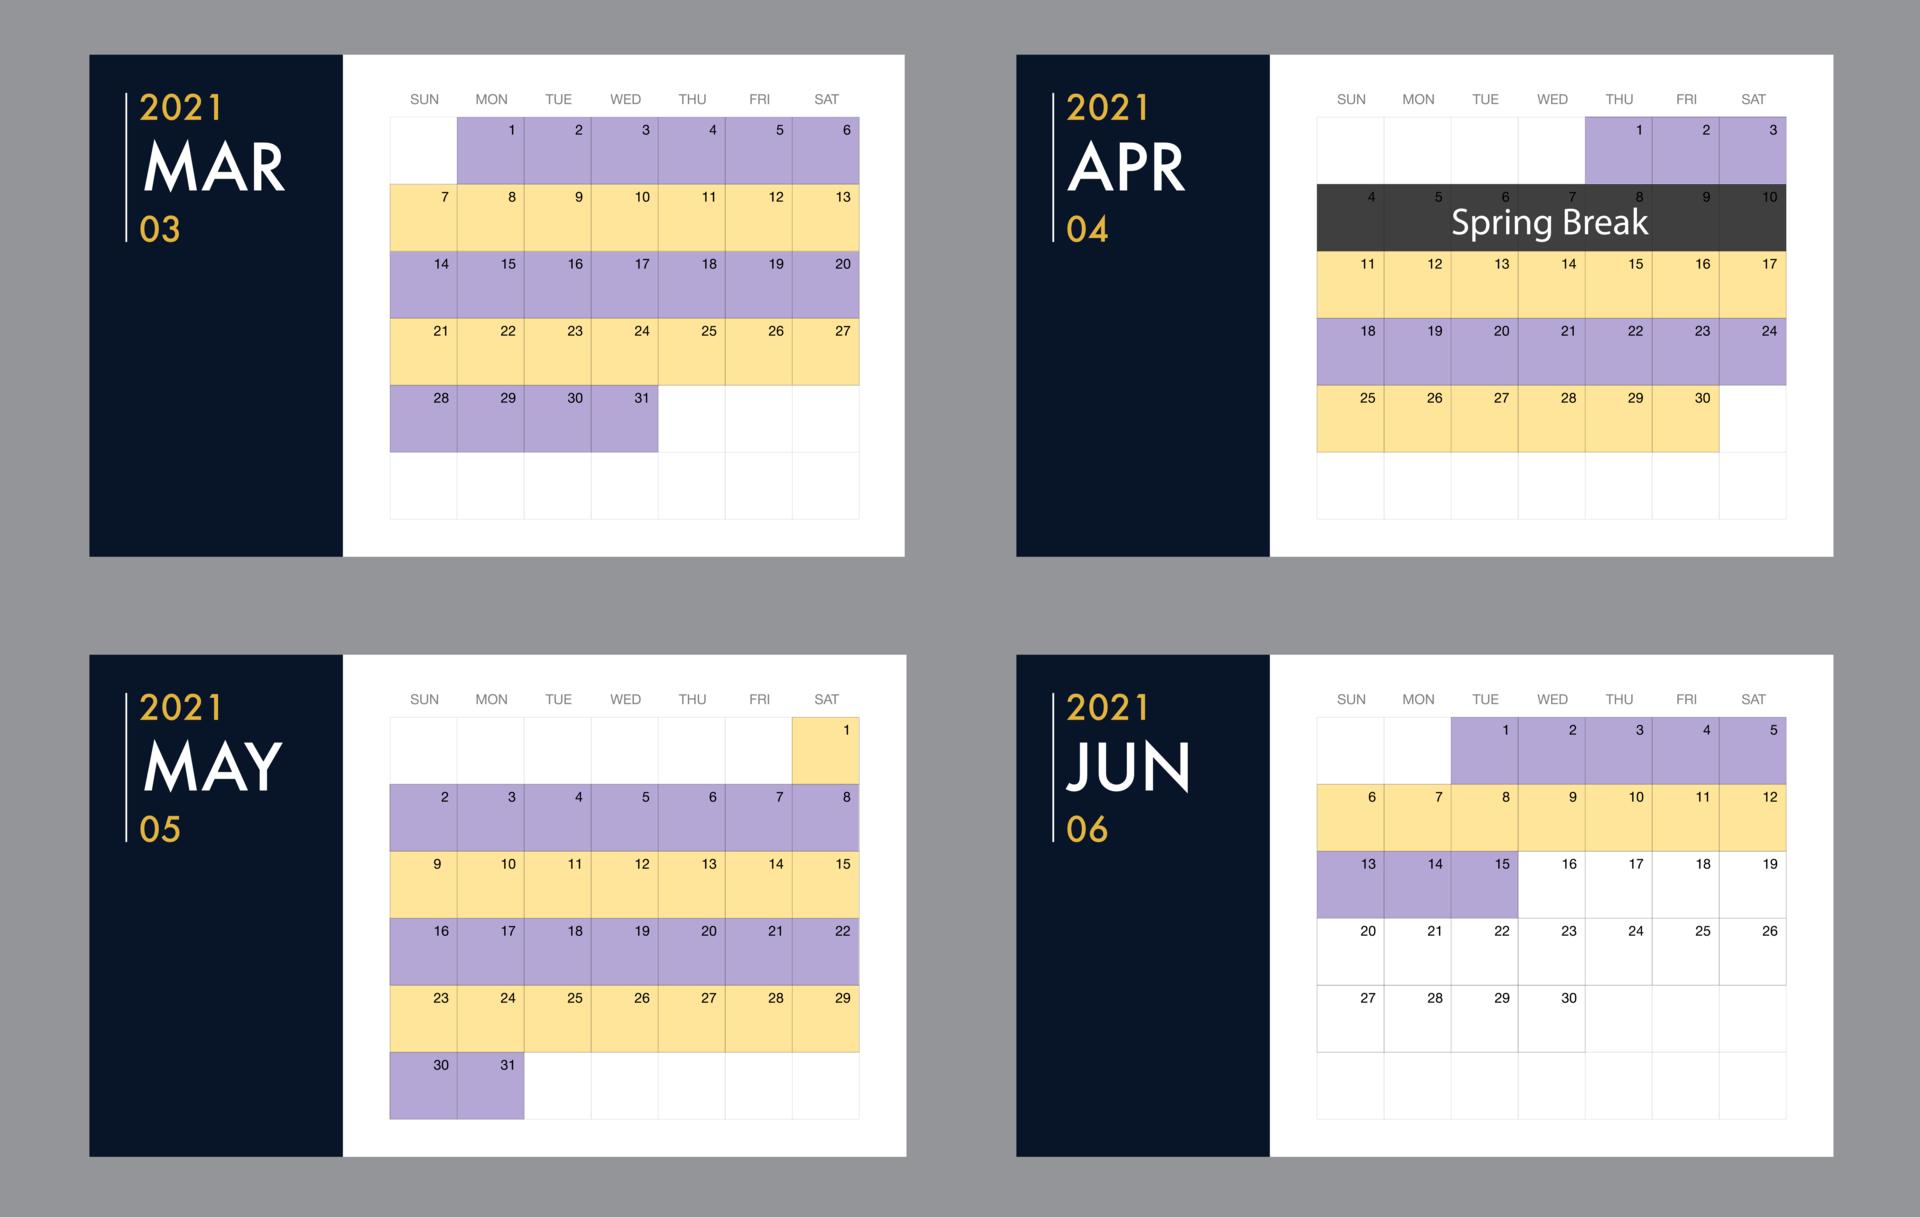 calendar graphic for the Hybrid Split schedule